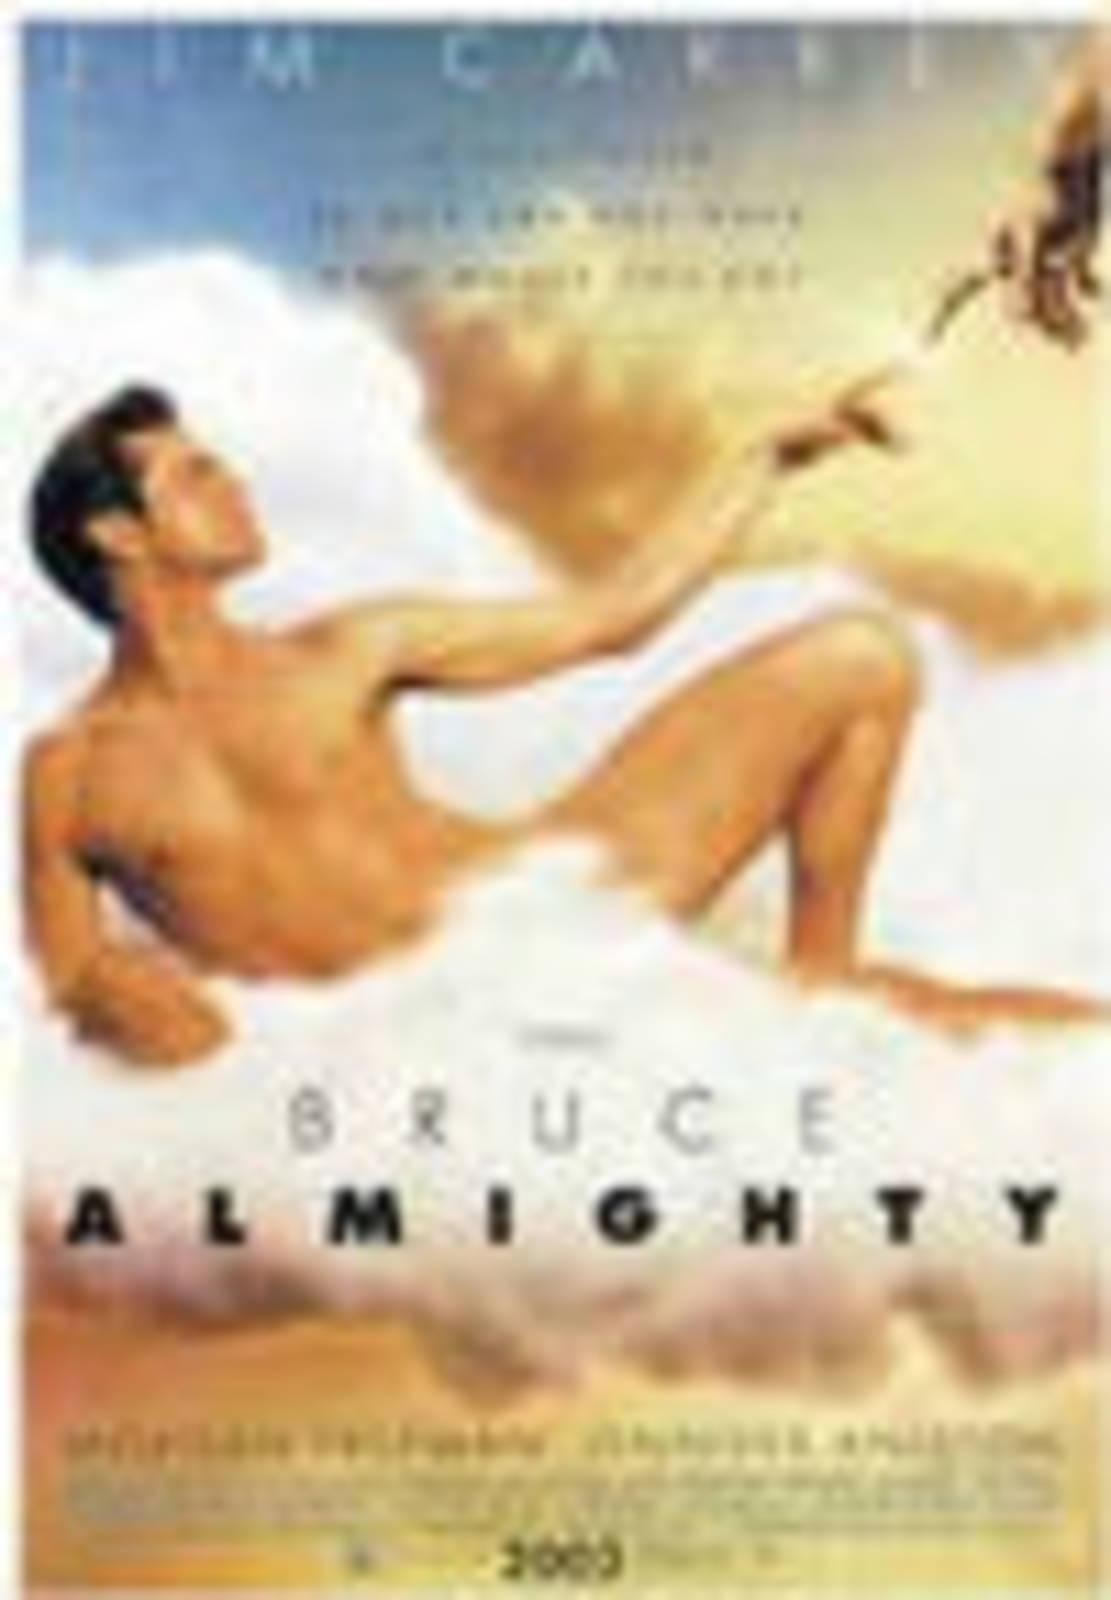 Bruce Allmächtig Netflix